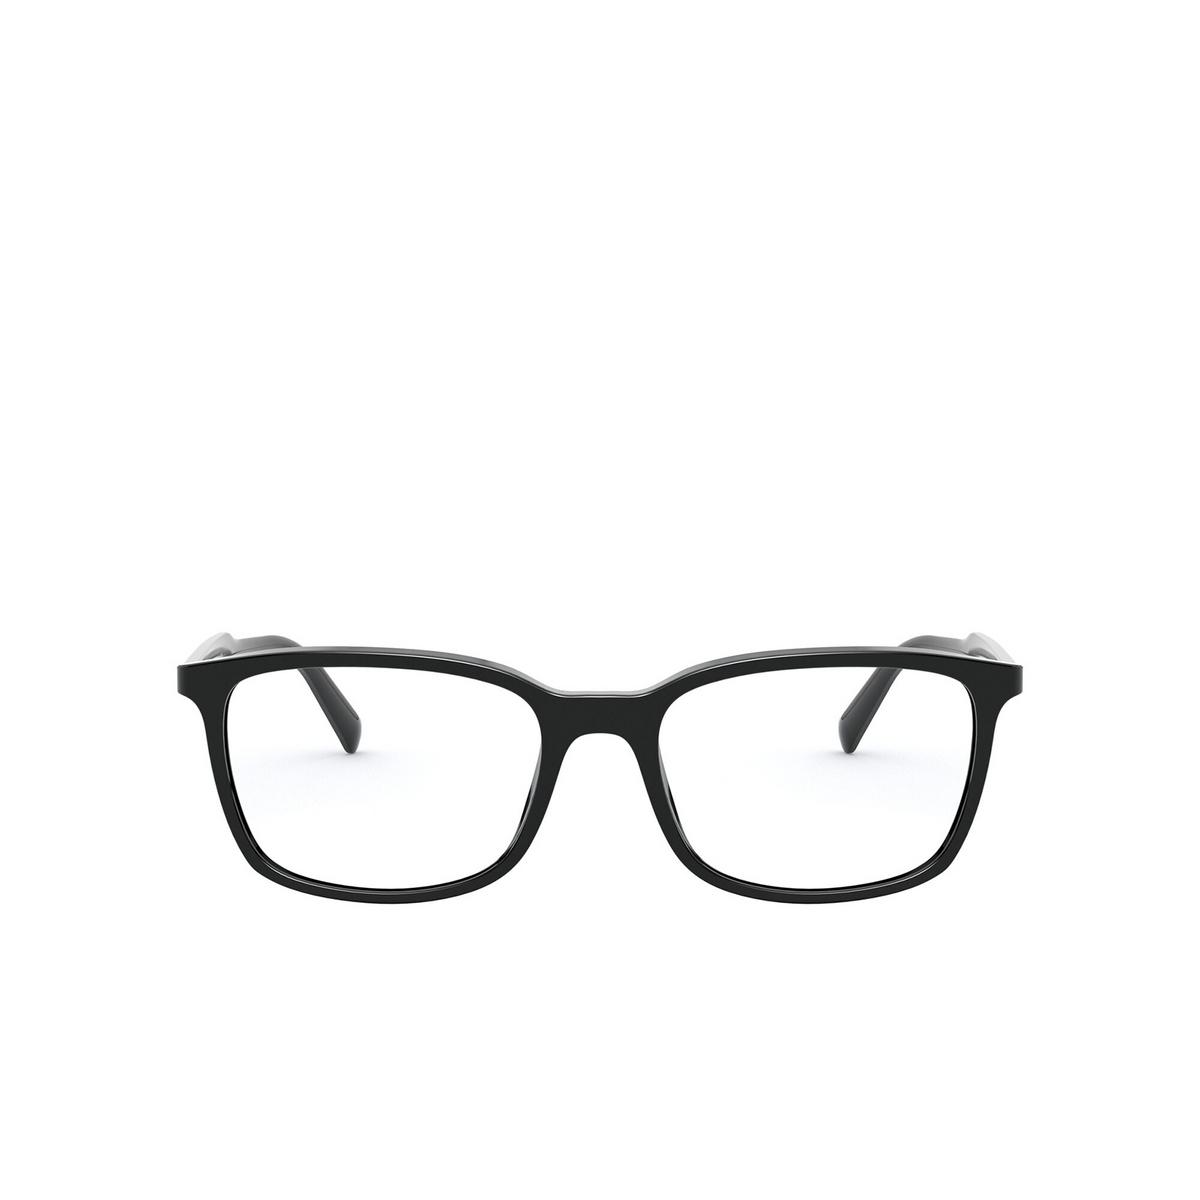 Prada® Rectangle Eyeglasses: Conceptual PR 13XV color Black 1AB1O1 - front view.